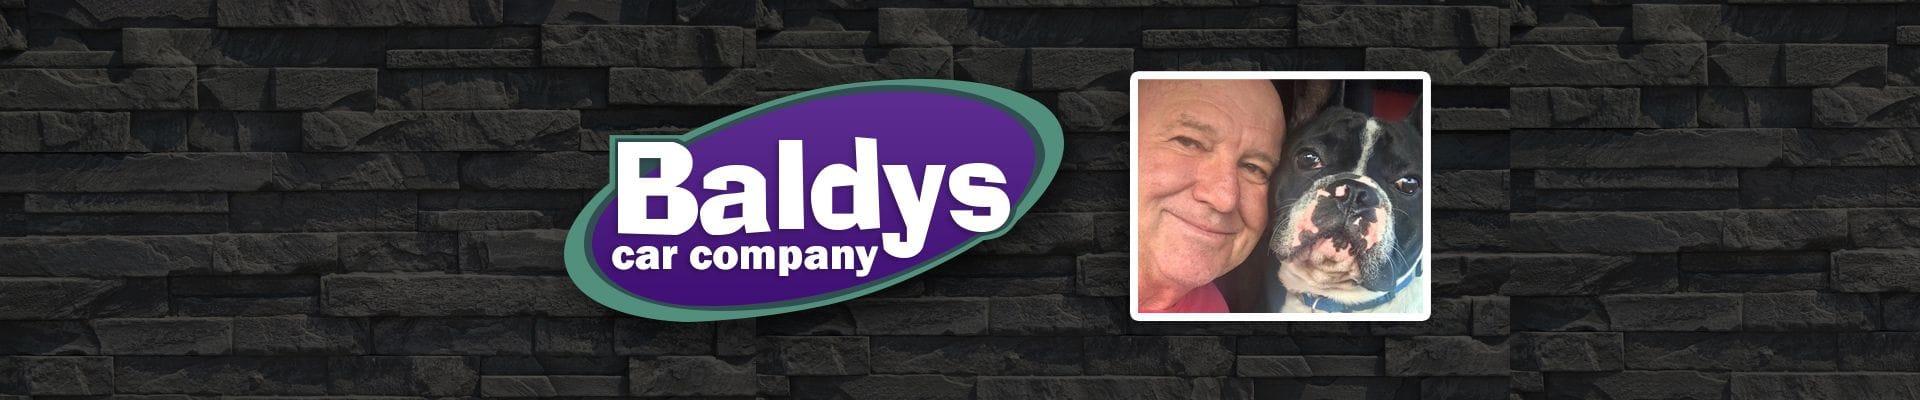 Baldys Car Company